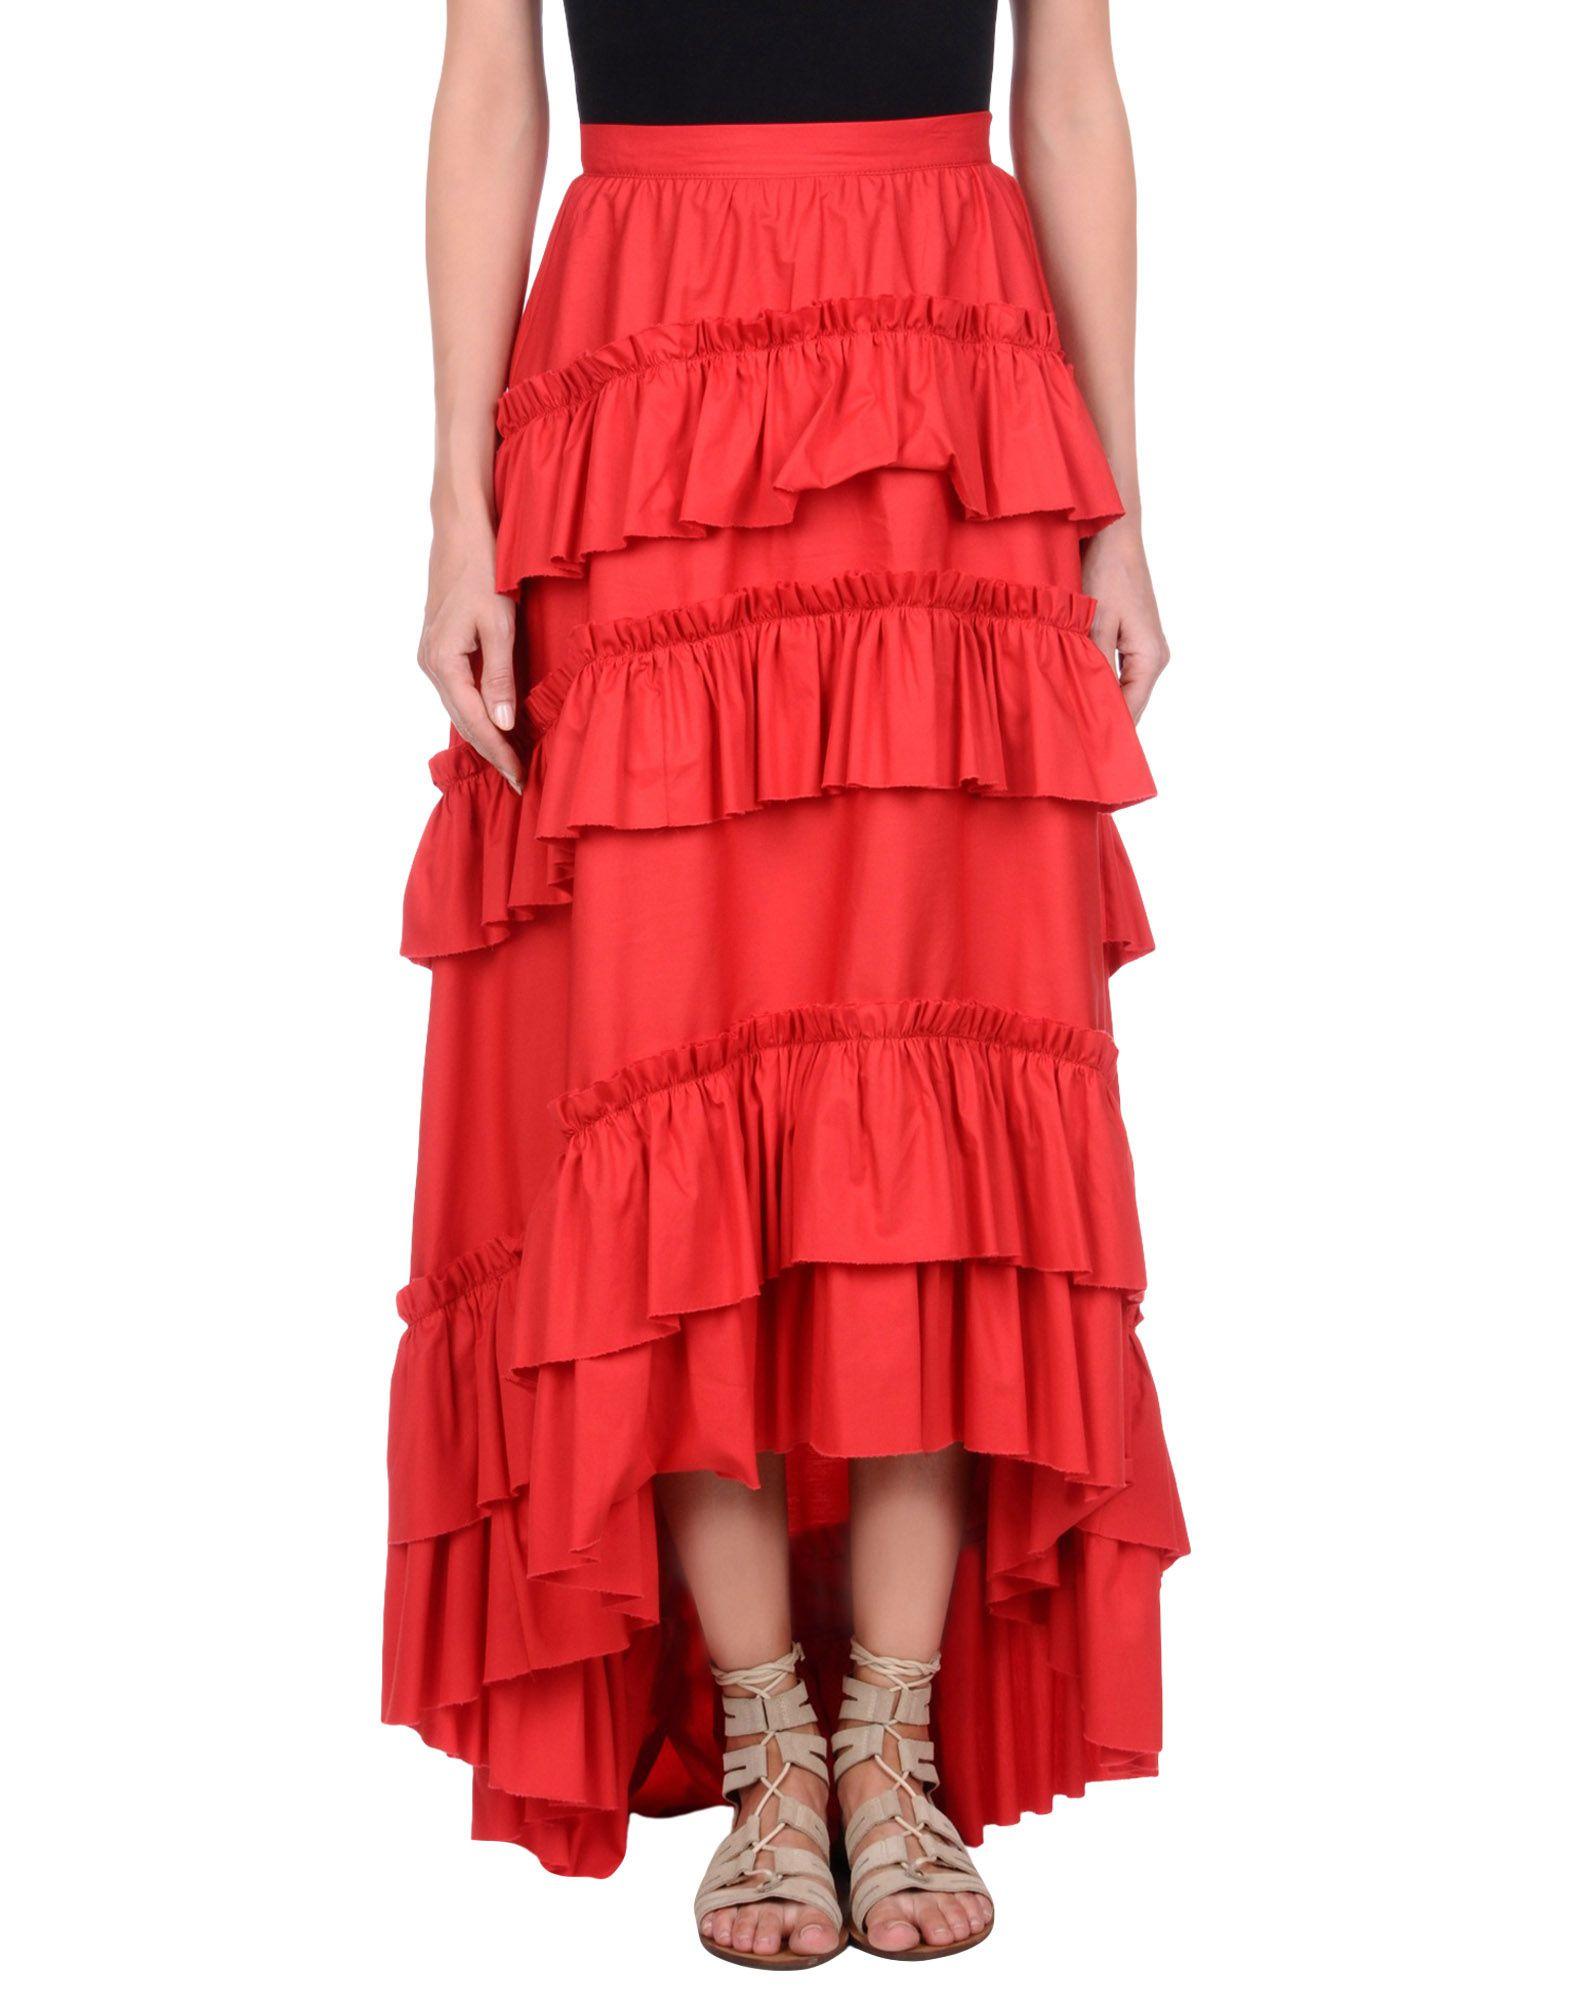 PHILOSOPHY di LORENZO SERAFINI Damen Midirock Farbe Rot Größe 5 jetztbilligerkaufen